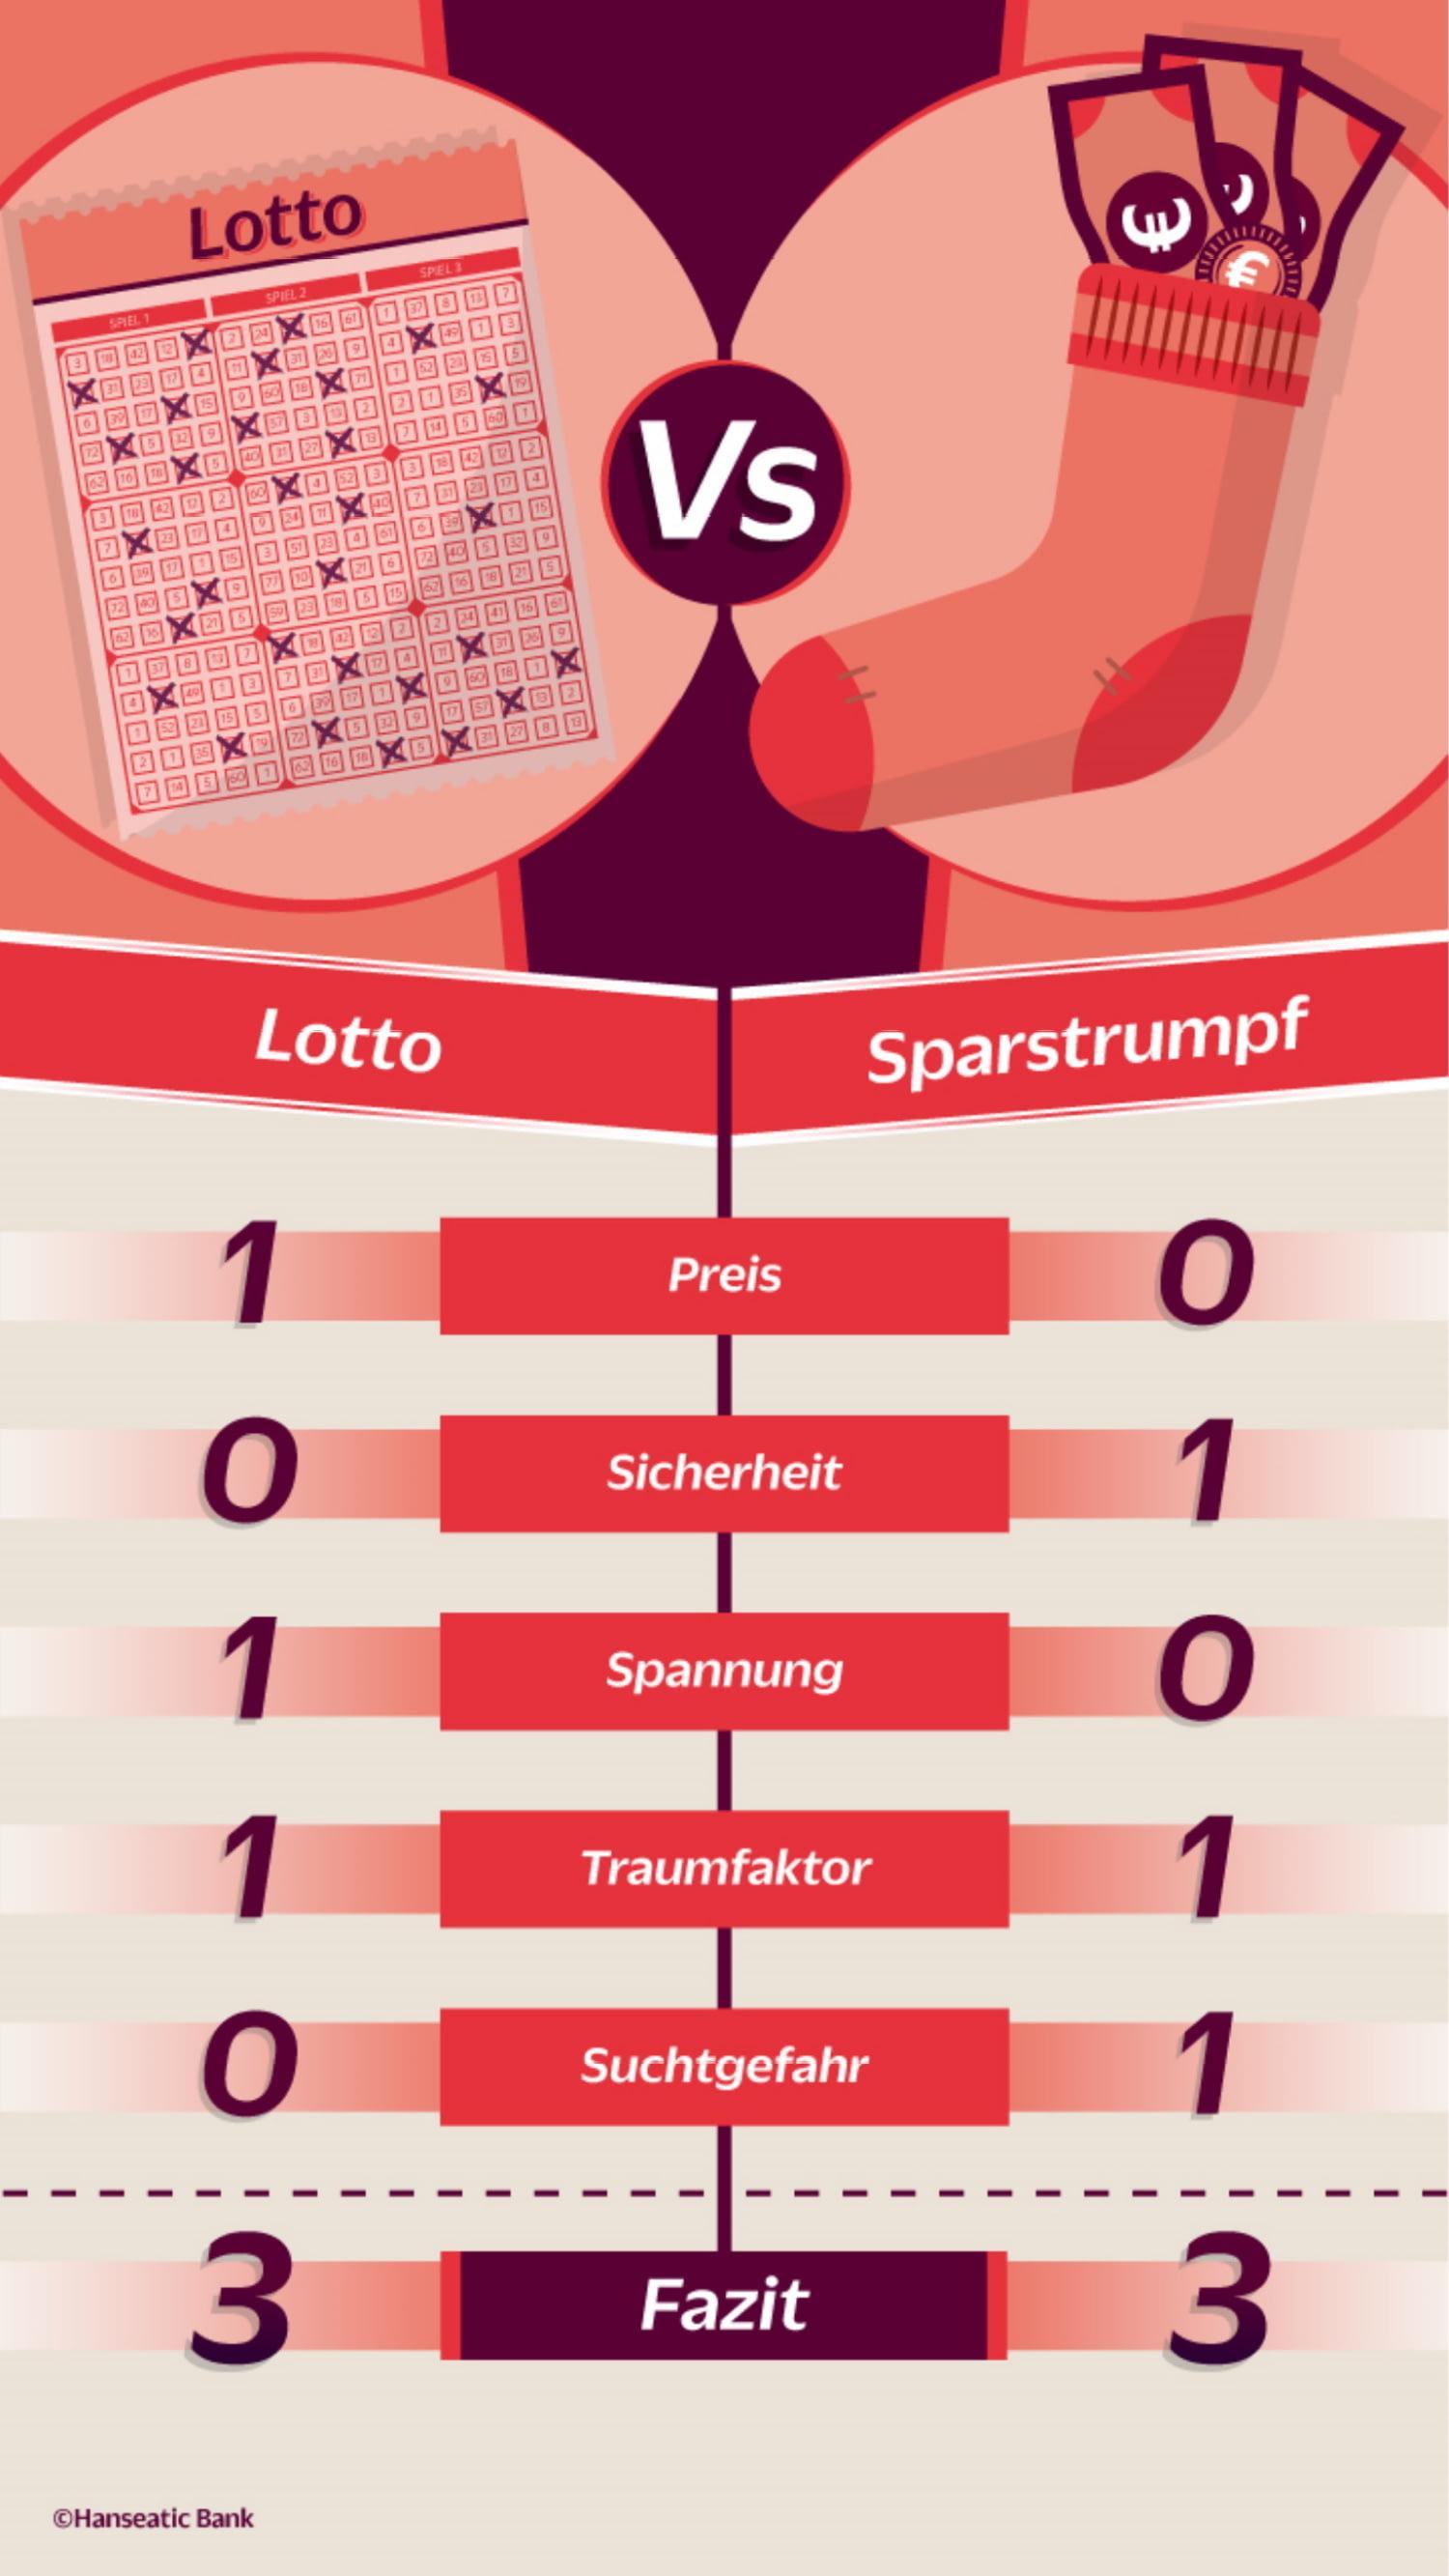 Lotto Wieviel Ist Drin